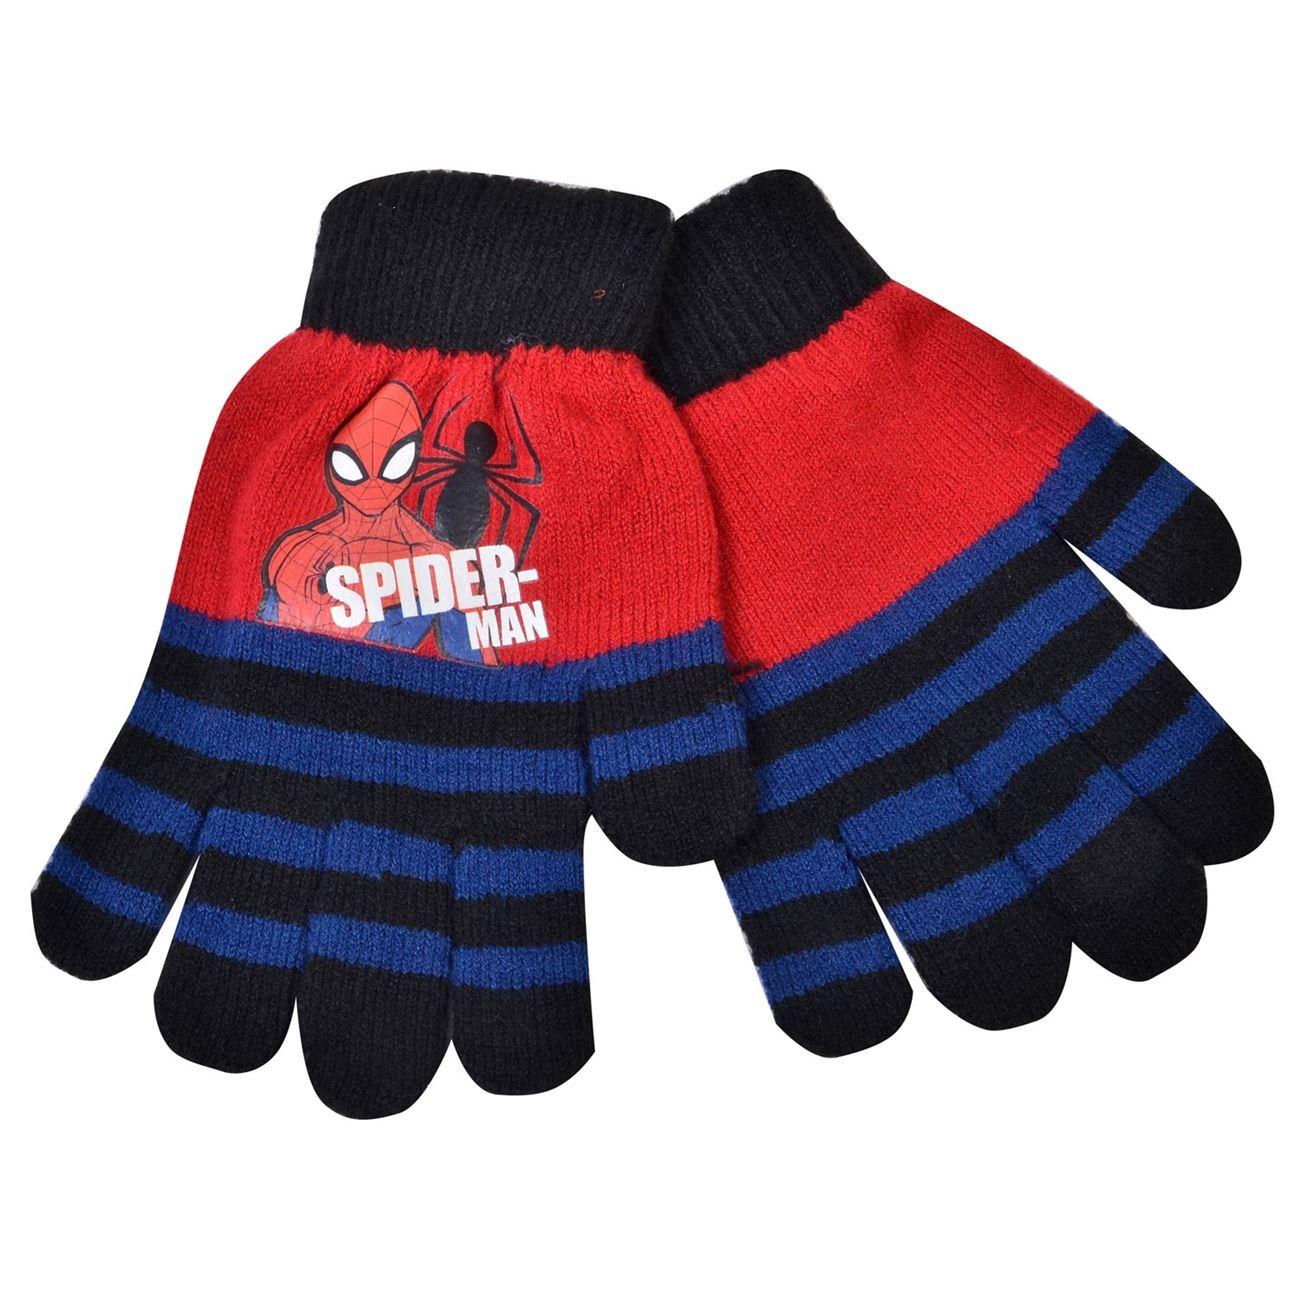 5e11eec6885 Παιδικά Γάντια Μπλε Κόκκινο SPIDERMAN < Γάντια Παιδικά για Αγόρια ετών 6-10  | Jumbo